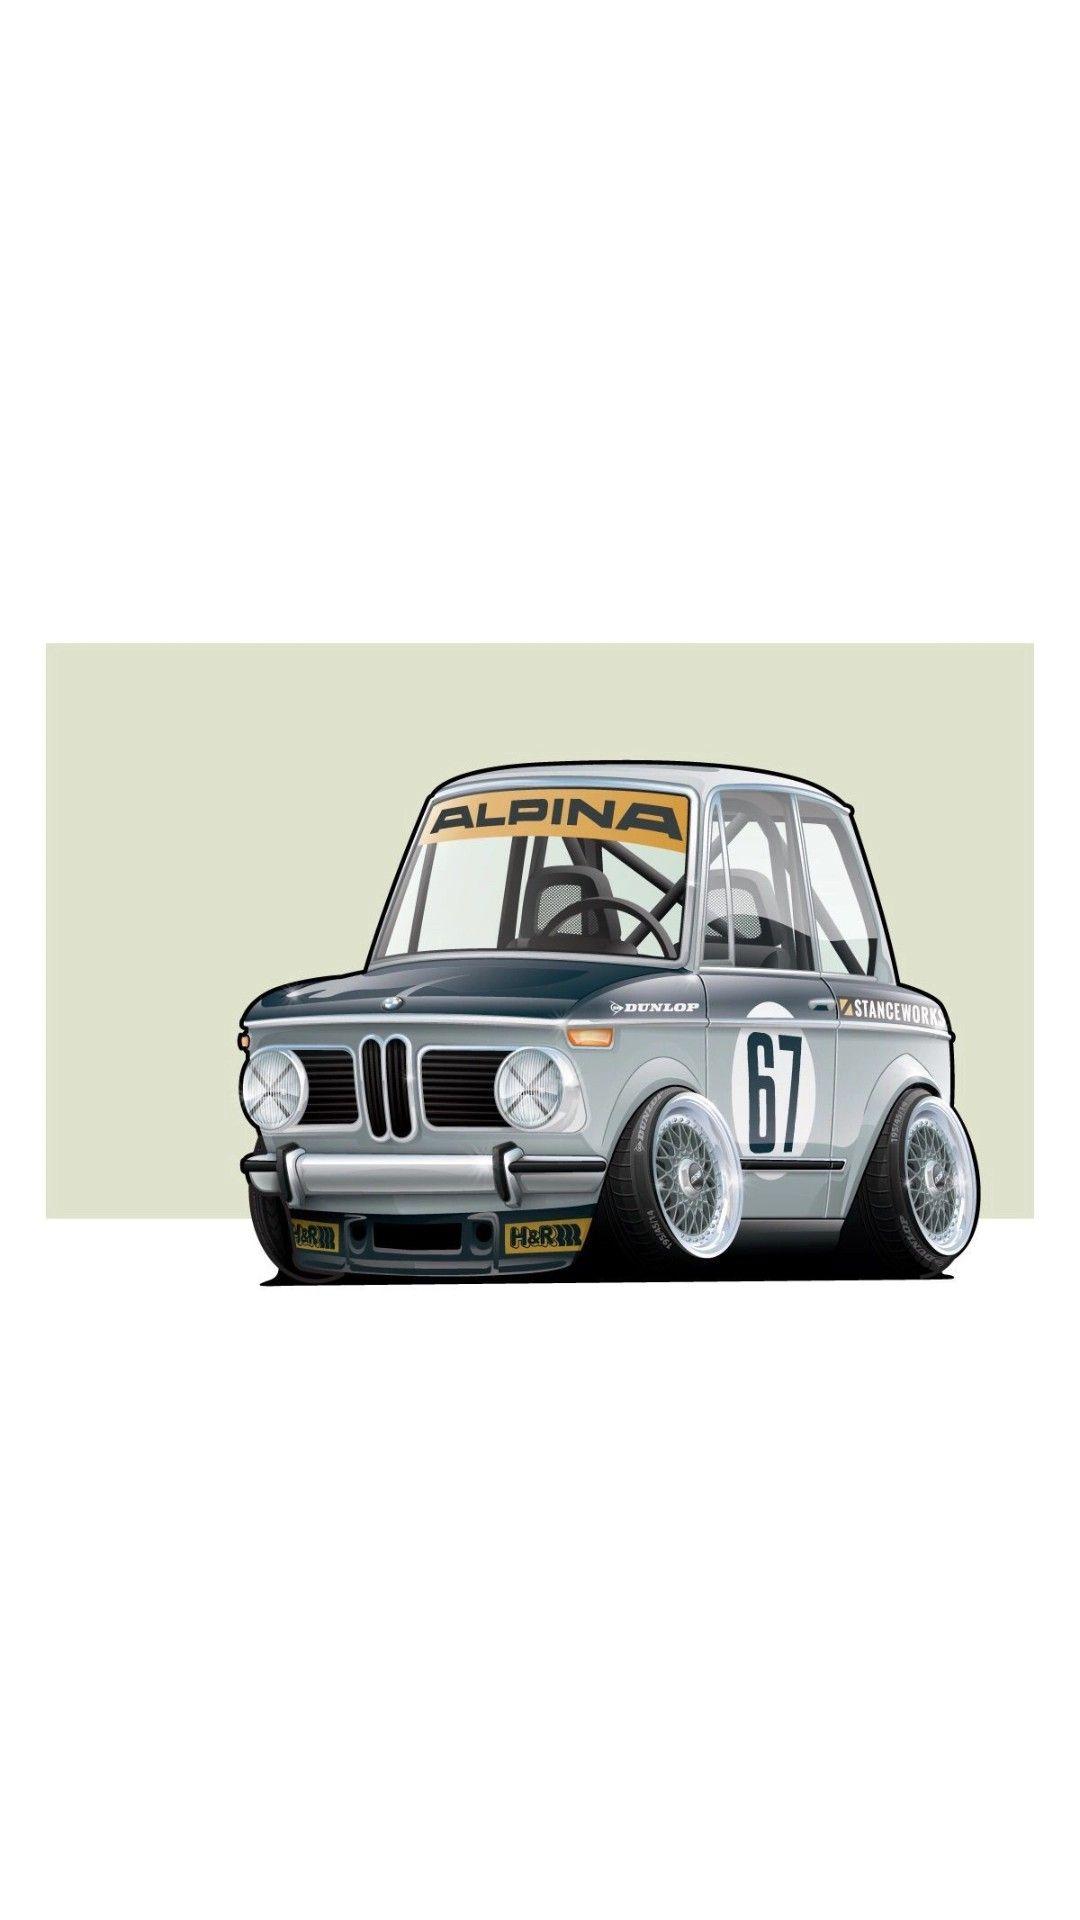 PanamaCochesAutos Felix Chial De En Y Motor Work Bavarian Pin n08PkOw